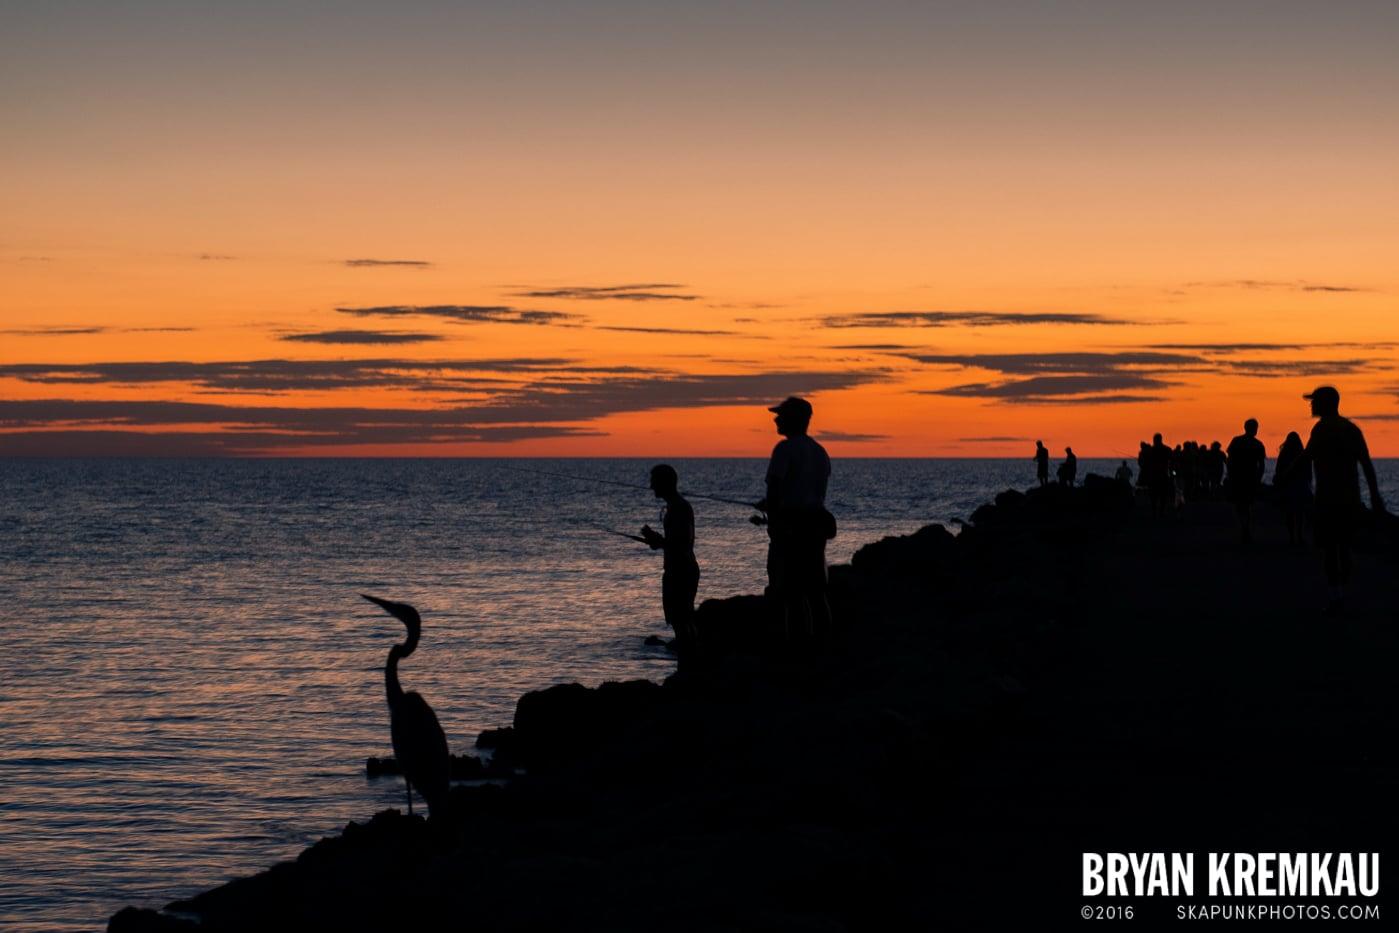 Sunsets, Astrophotography & Birds @ Venice, Florida - 10.25.14 - 11.5.14 (123)